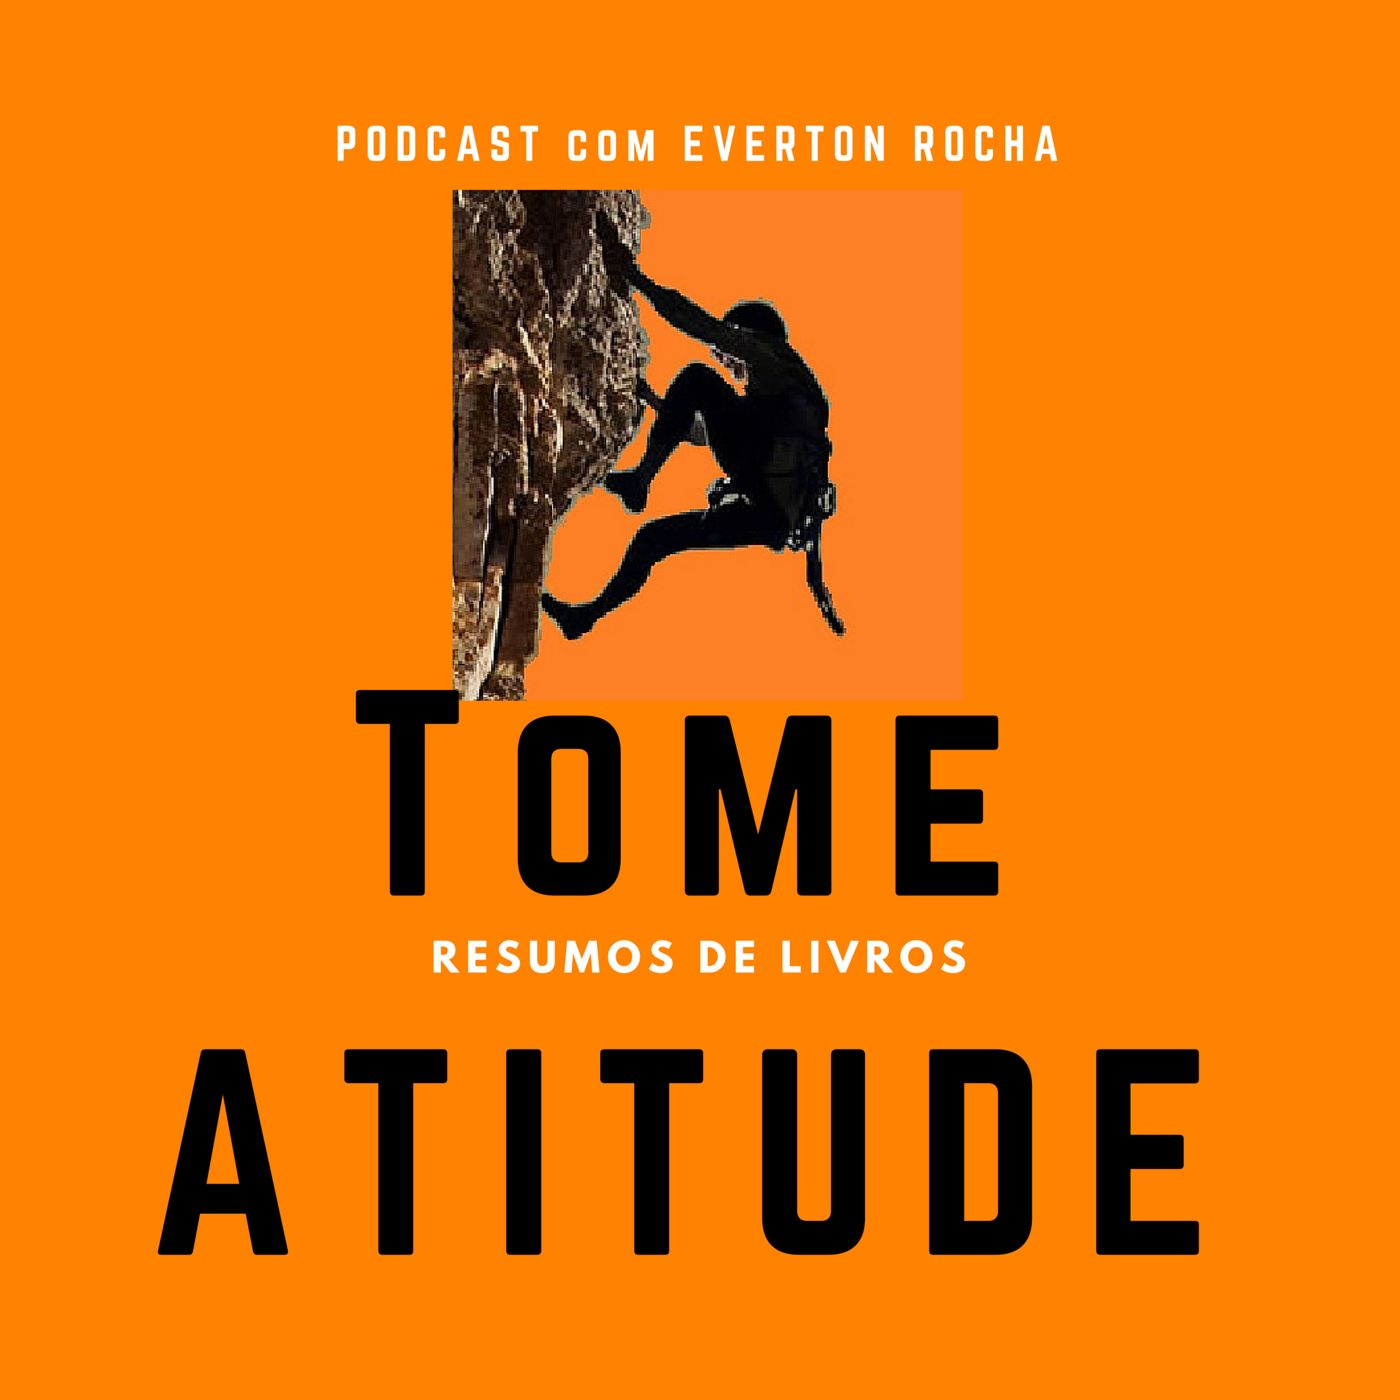 Tome Atitude